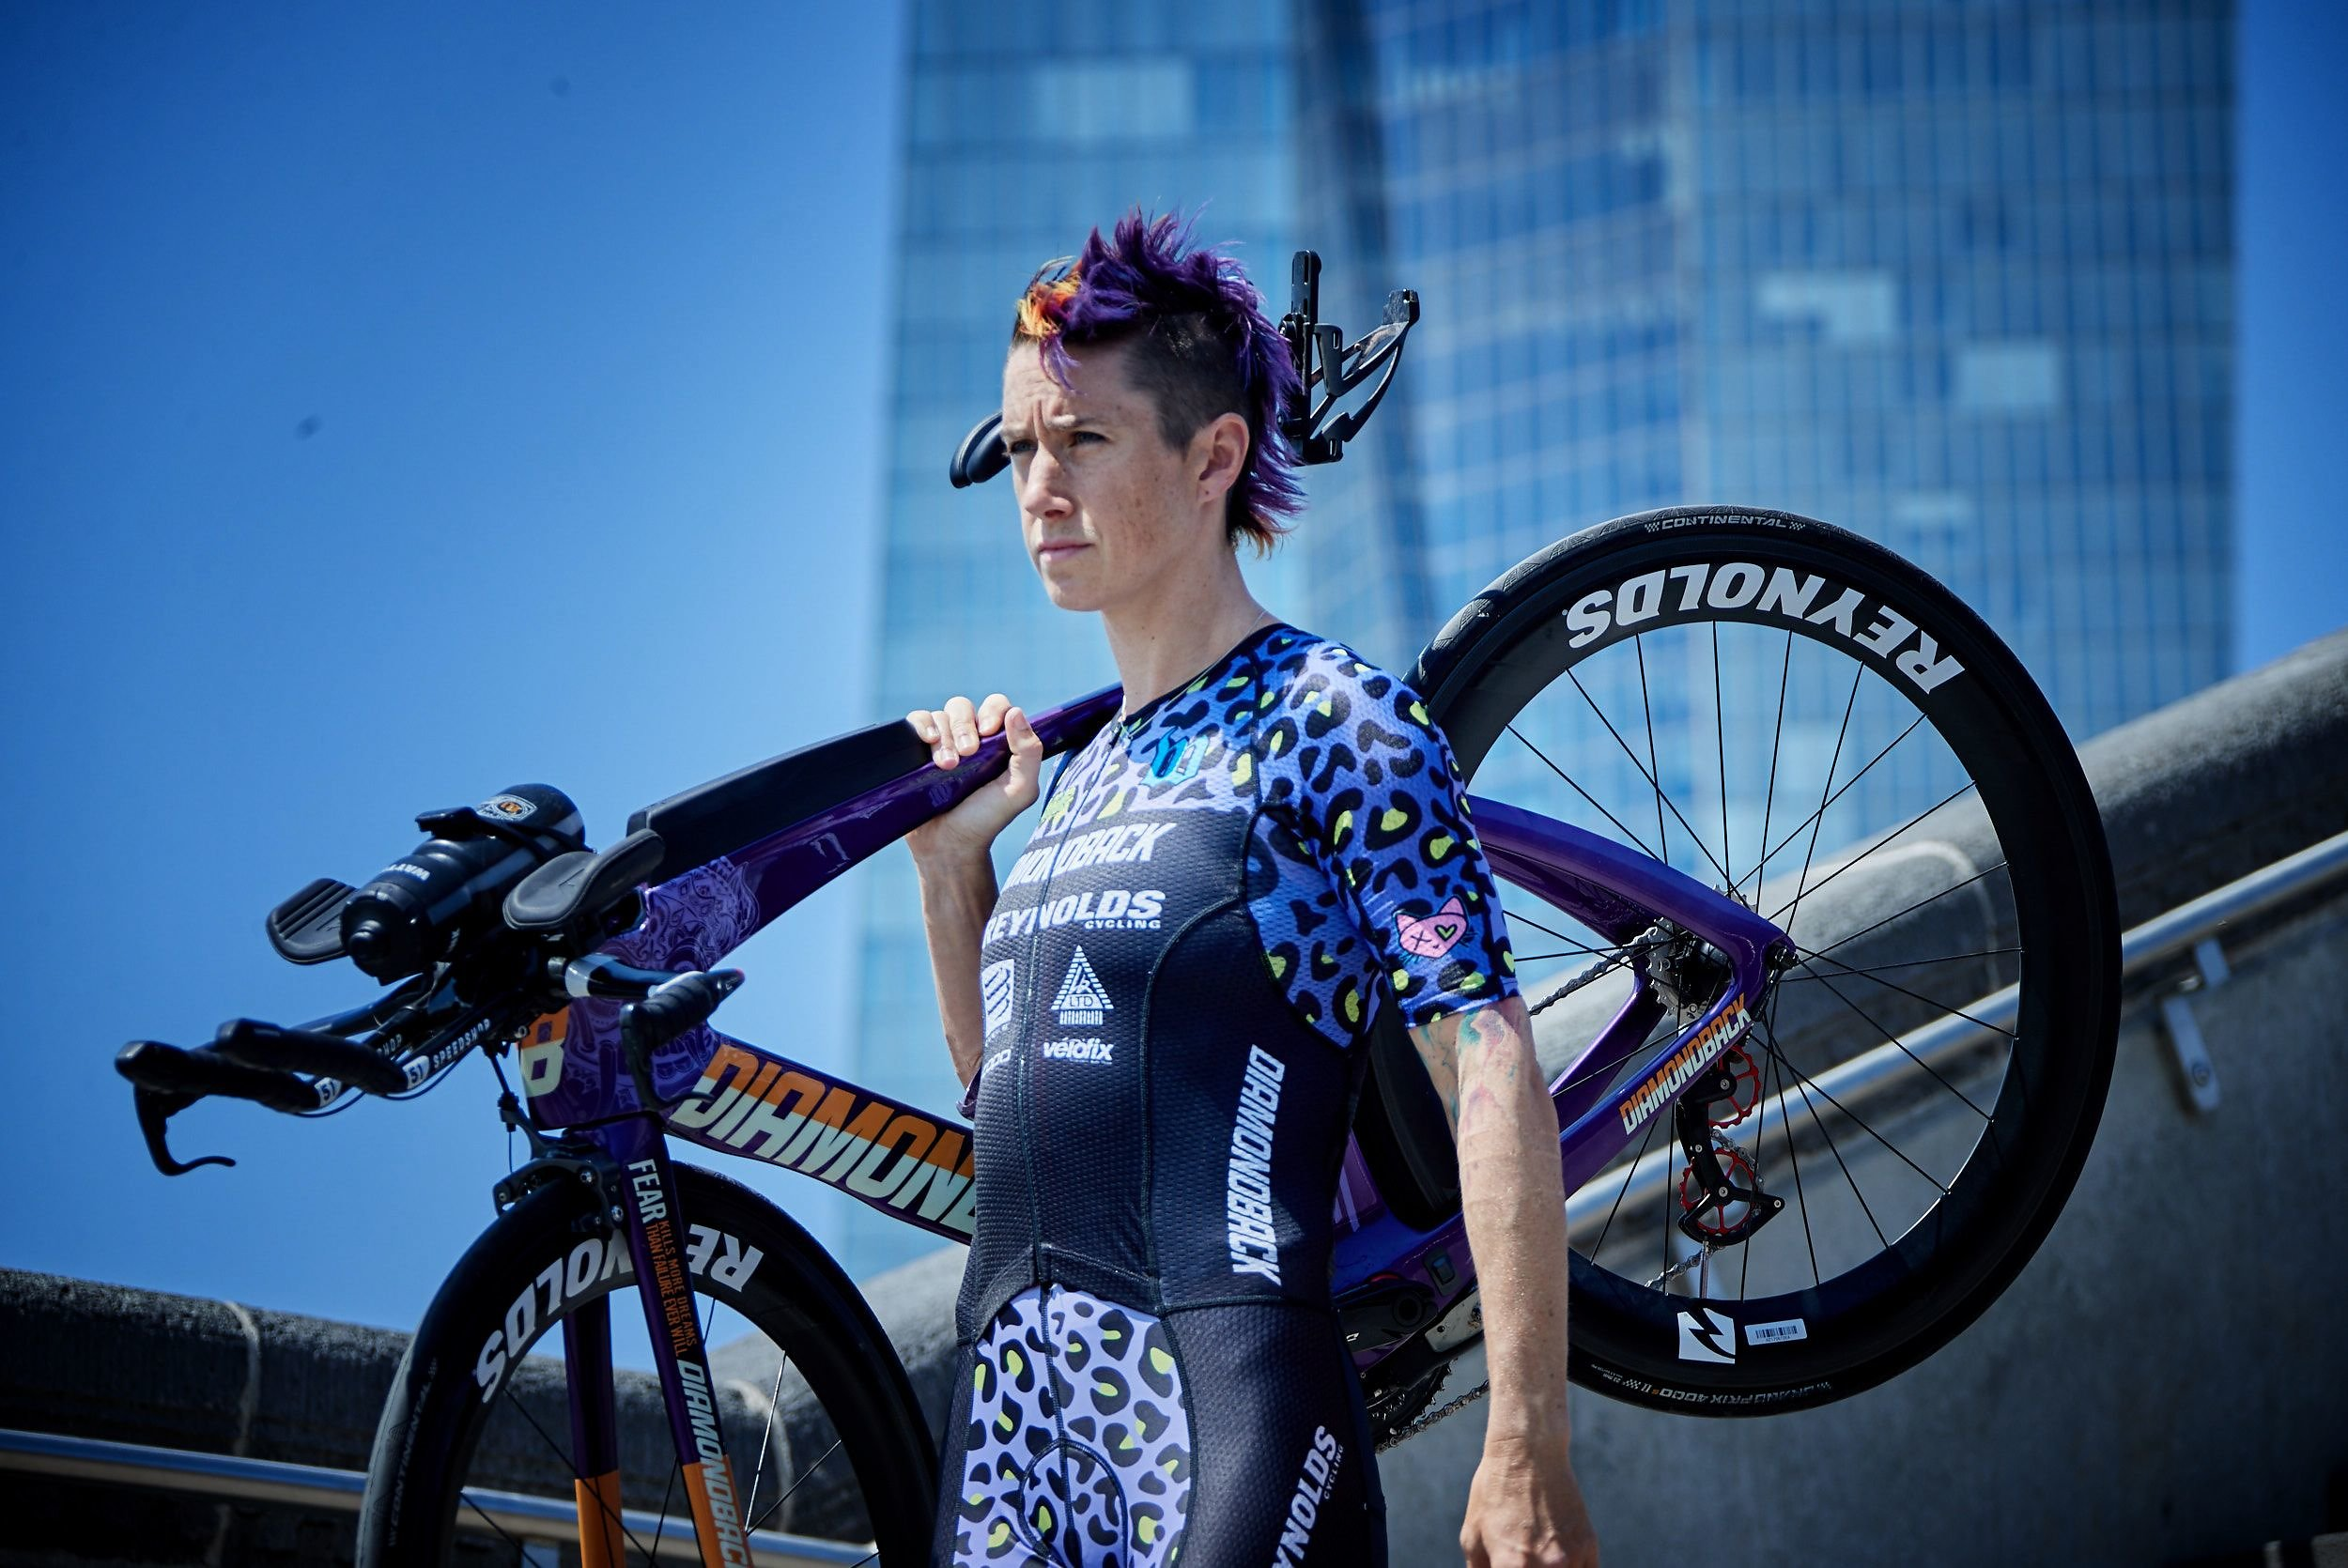 Coach_Terry_Wilson_Pursuit_of_The_Perfect_Race_IRONMAN_Franktfurt_Rachel_McBride_Isaak_Papadopoulos_Bike_Carry.jpg